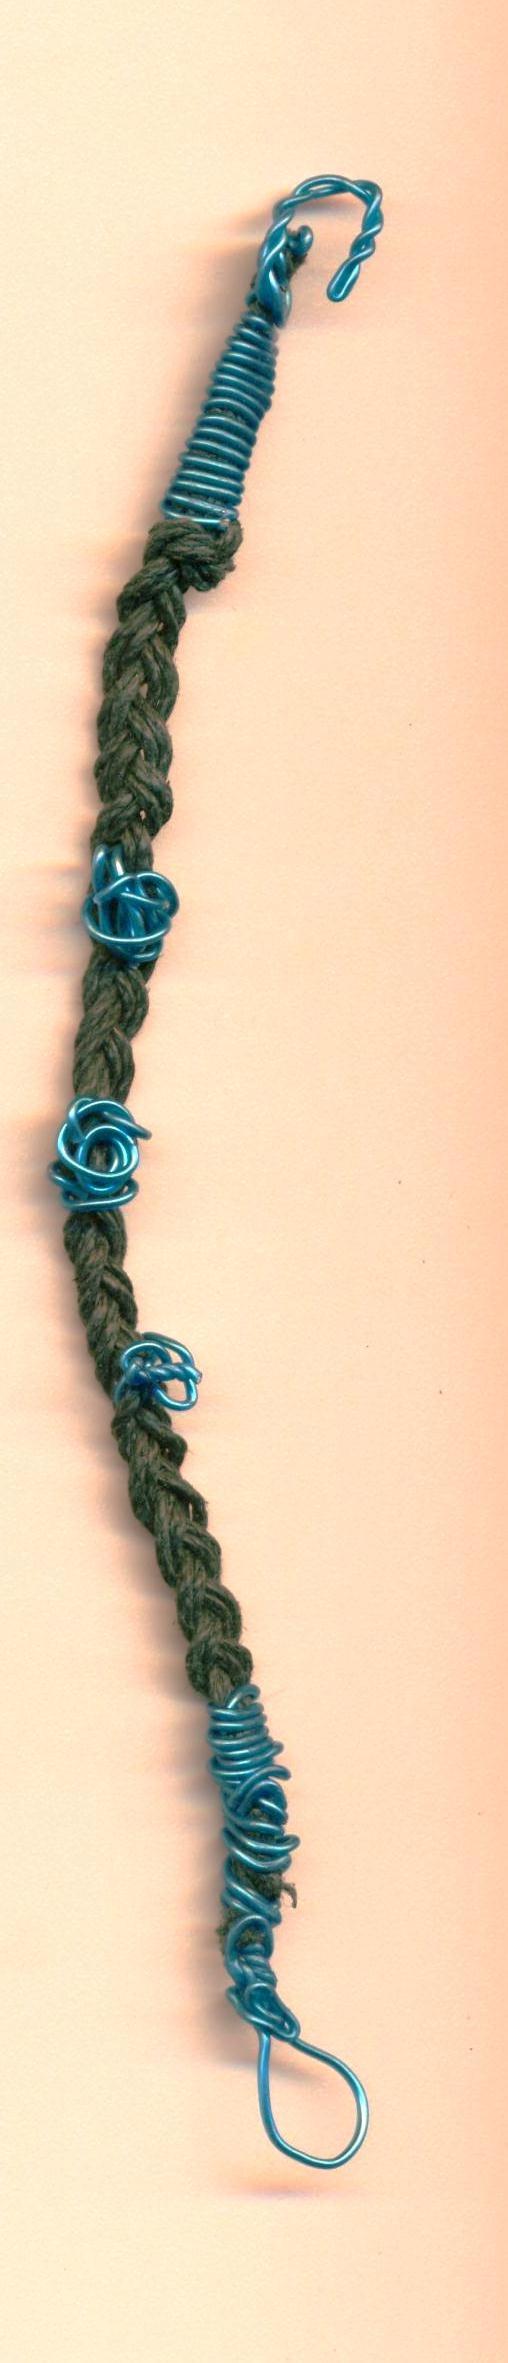 trenza azul marino con hilo metálico azul. Pulsera indu hecha con amor en Rosarito